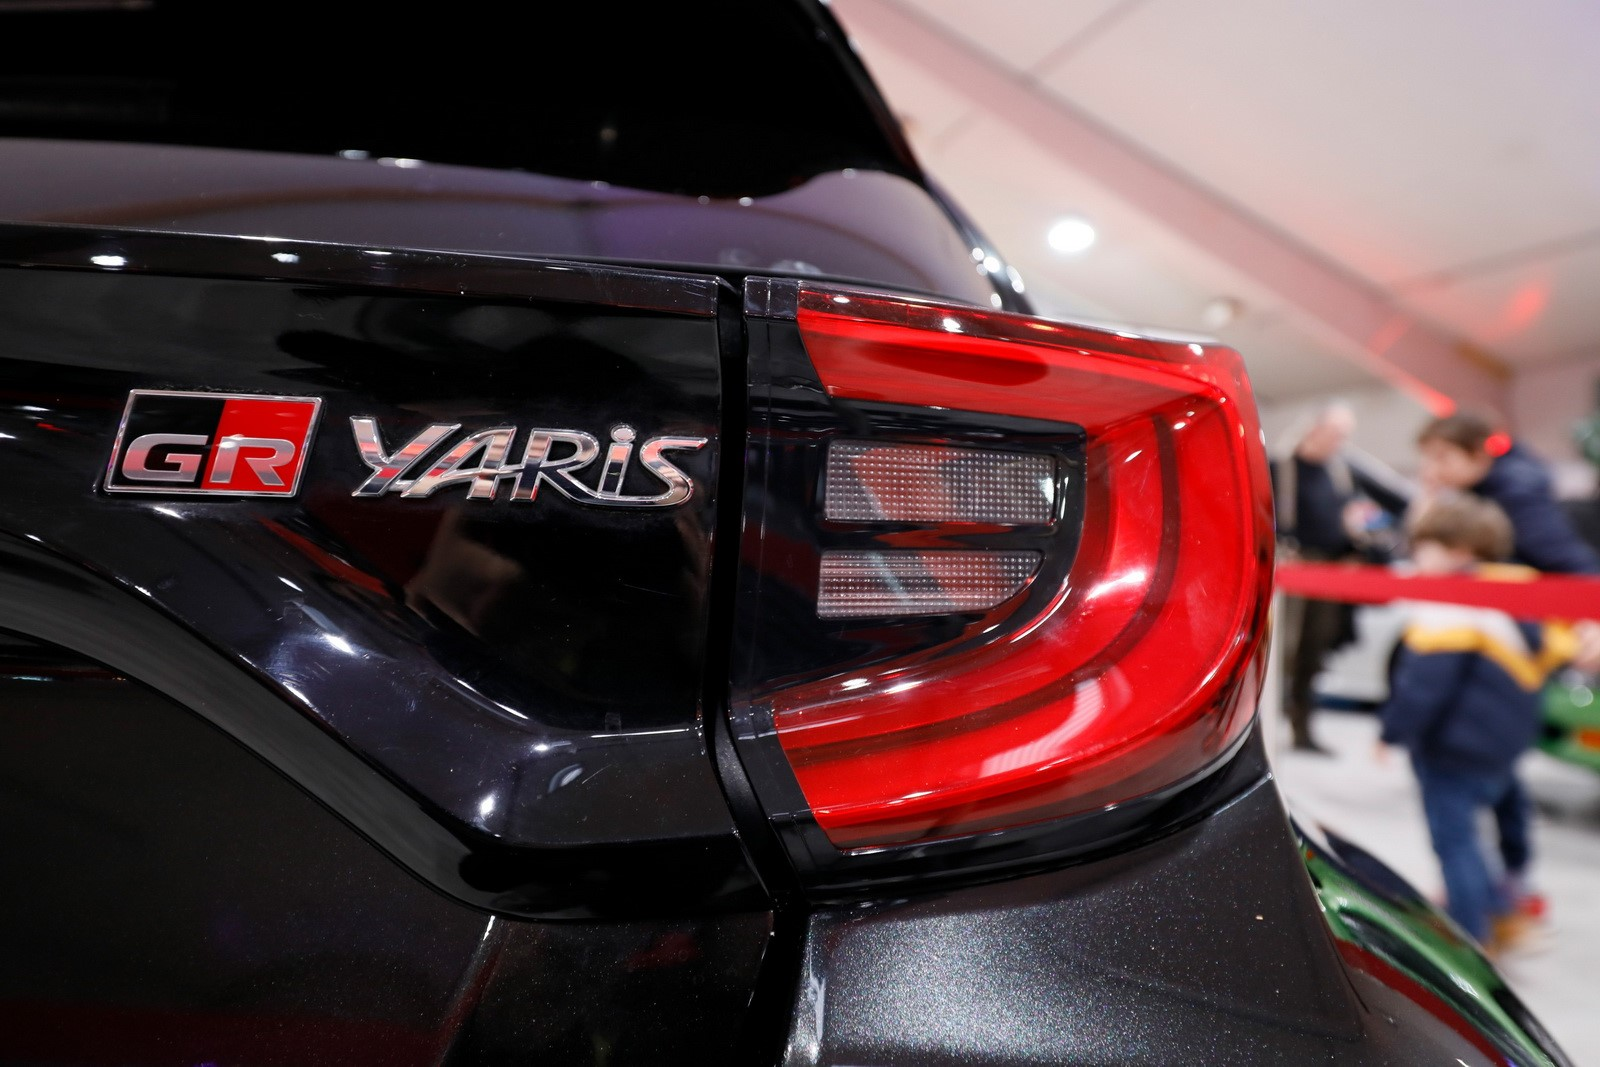 Bmlack_Toyota_GR_Yaris_0003